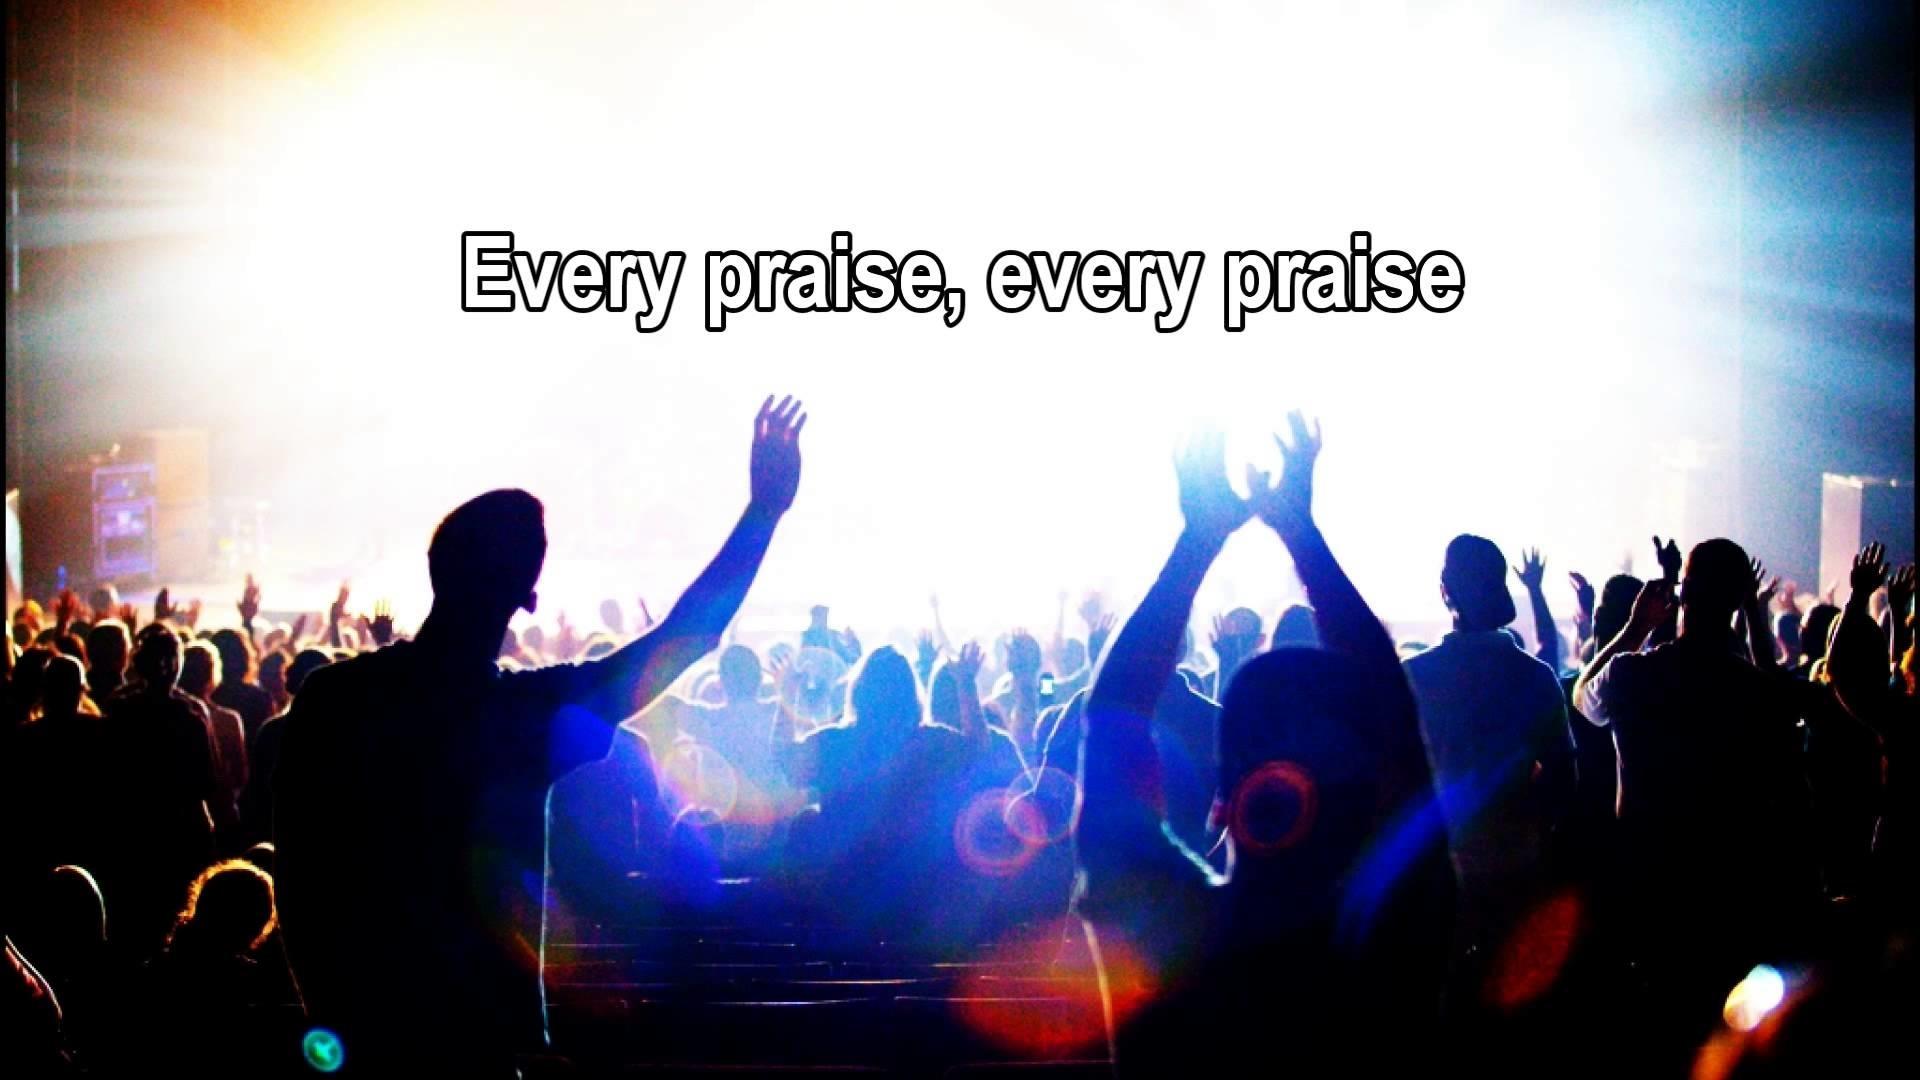 Every Praise – Hezekiah Walker (Best Worship Song with Lyrics)